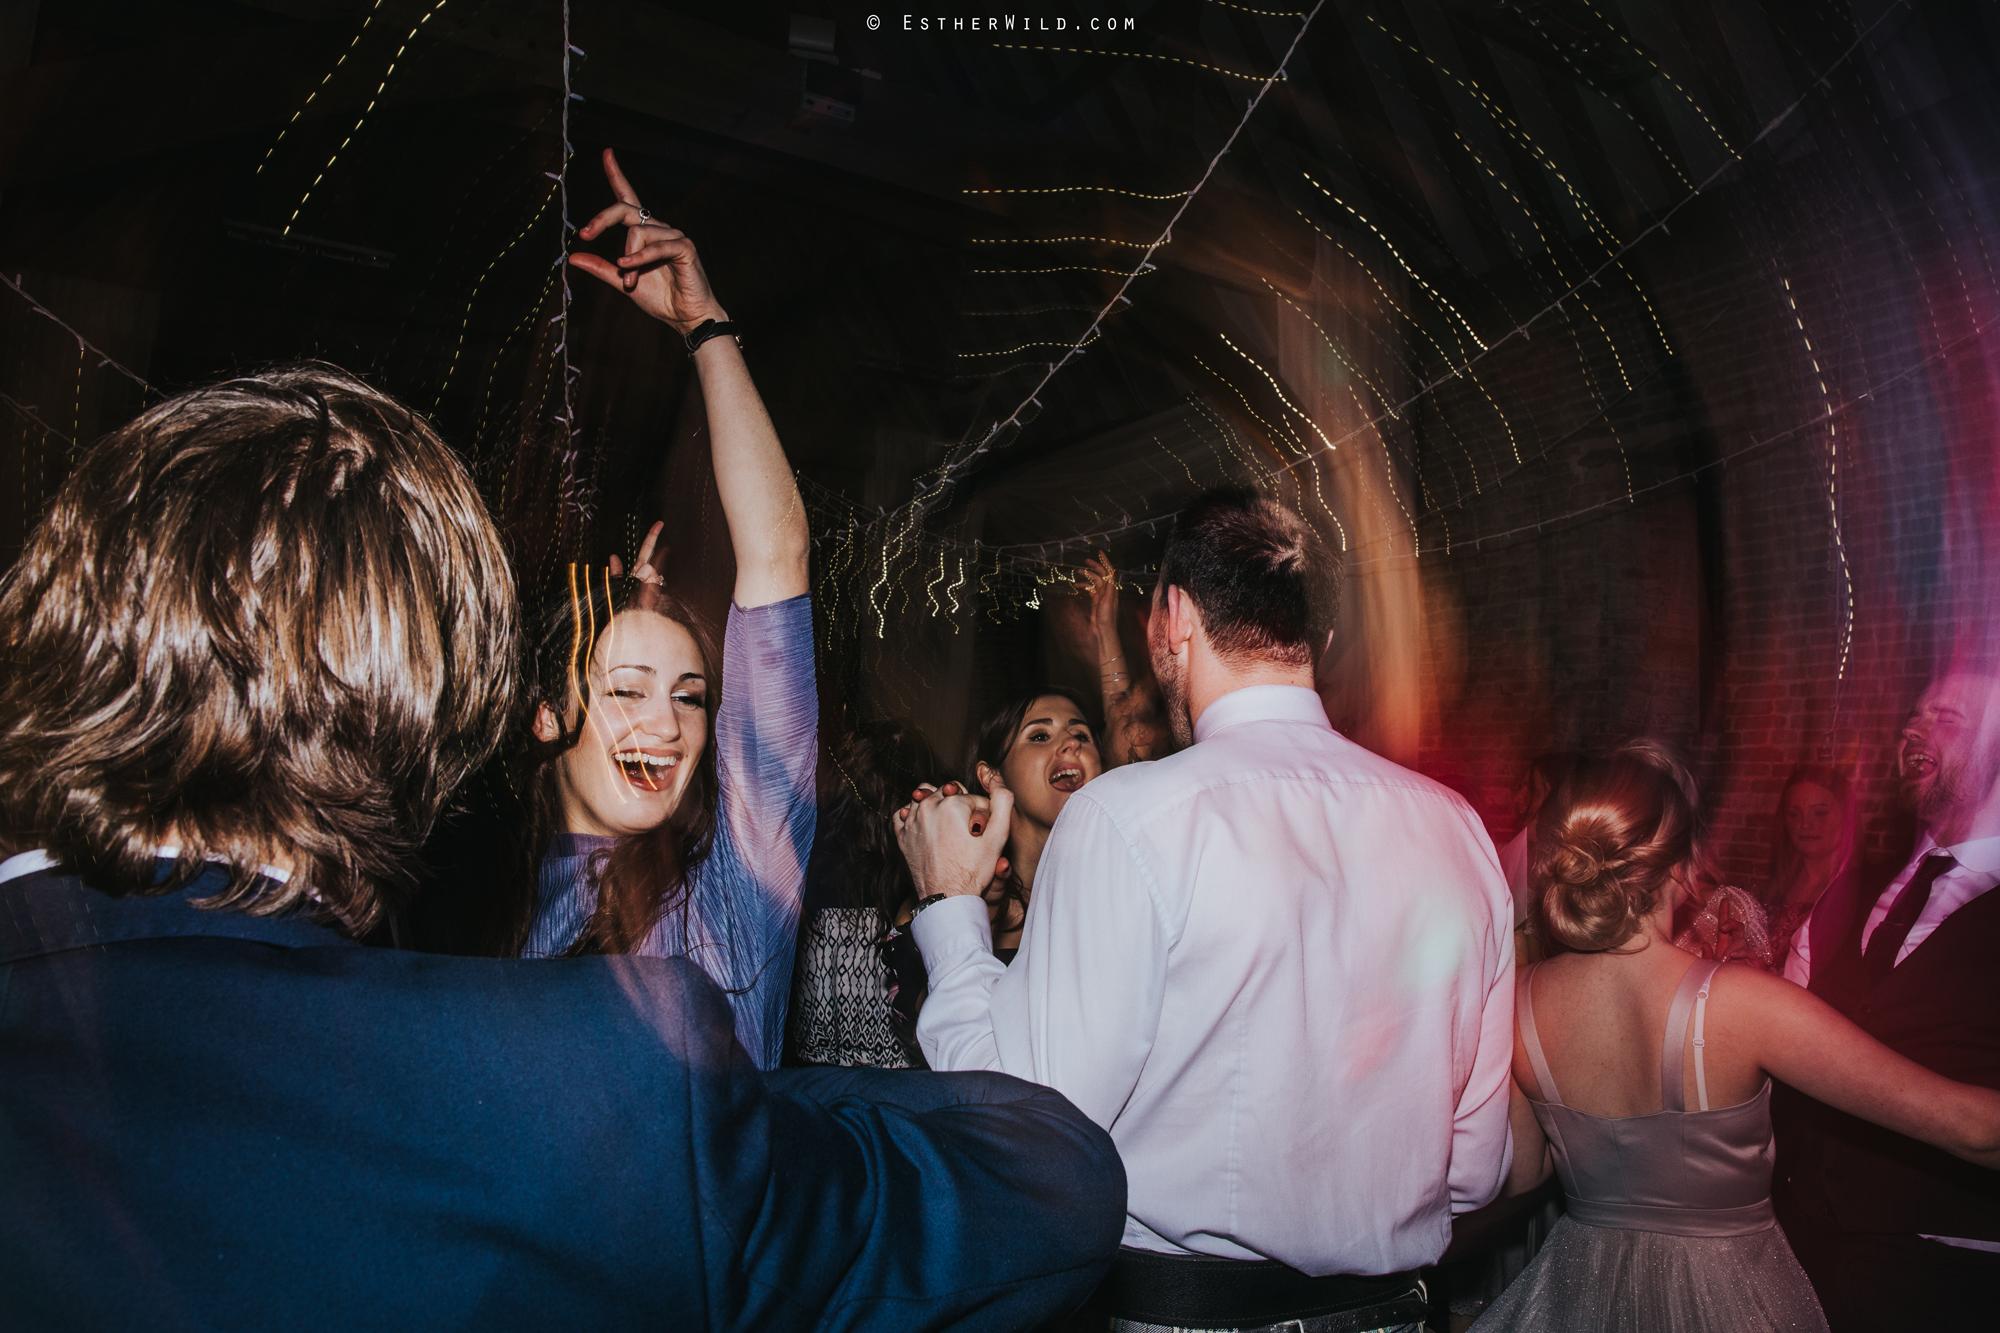 Elms_Barn_Weddings_Suffolk_Photographer_Copyright_Esther_Wild_IMG_3663.jpg